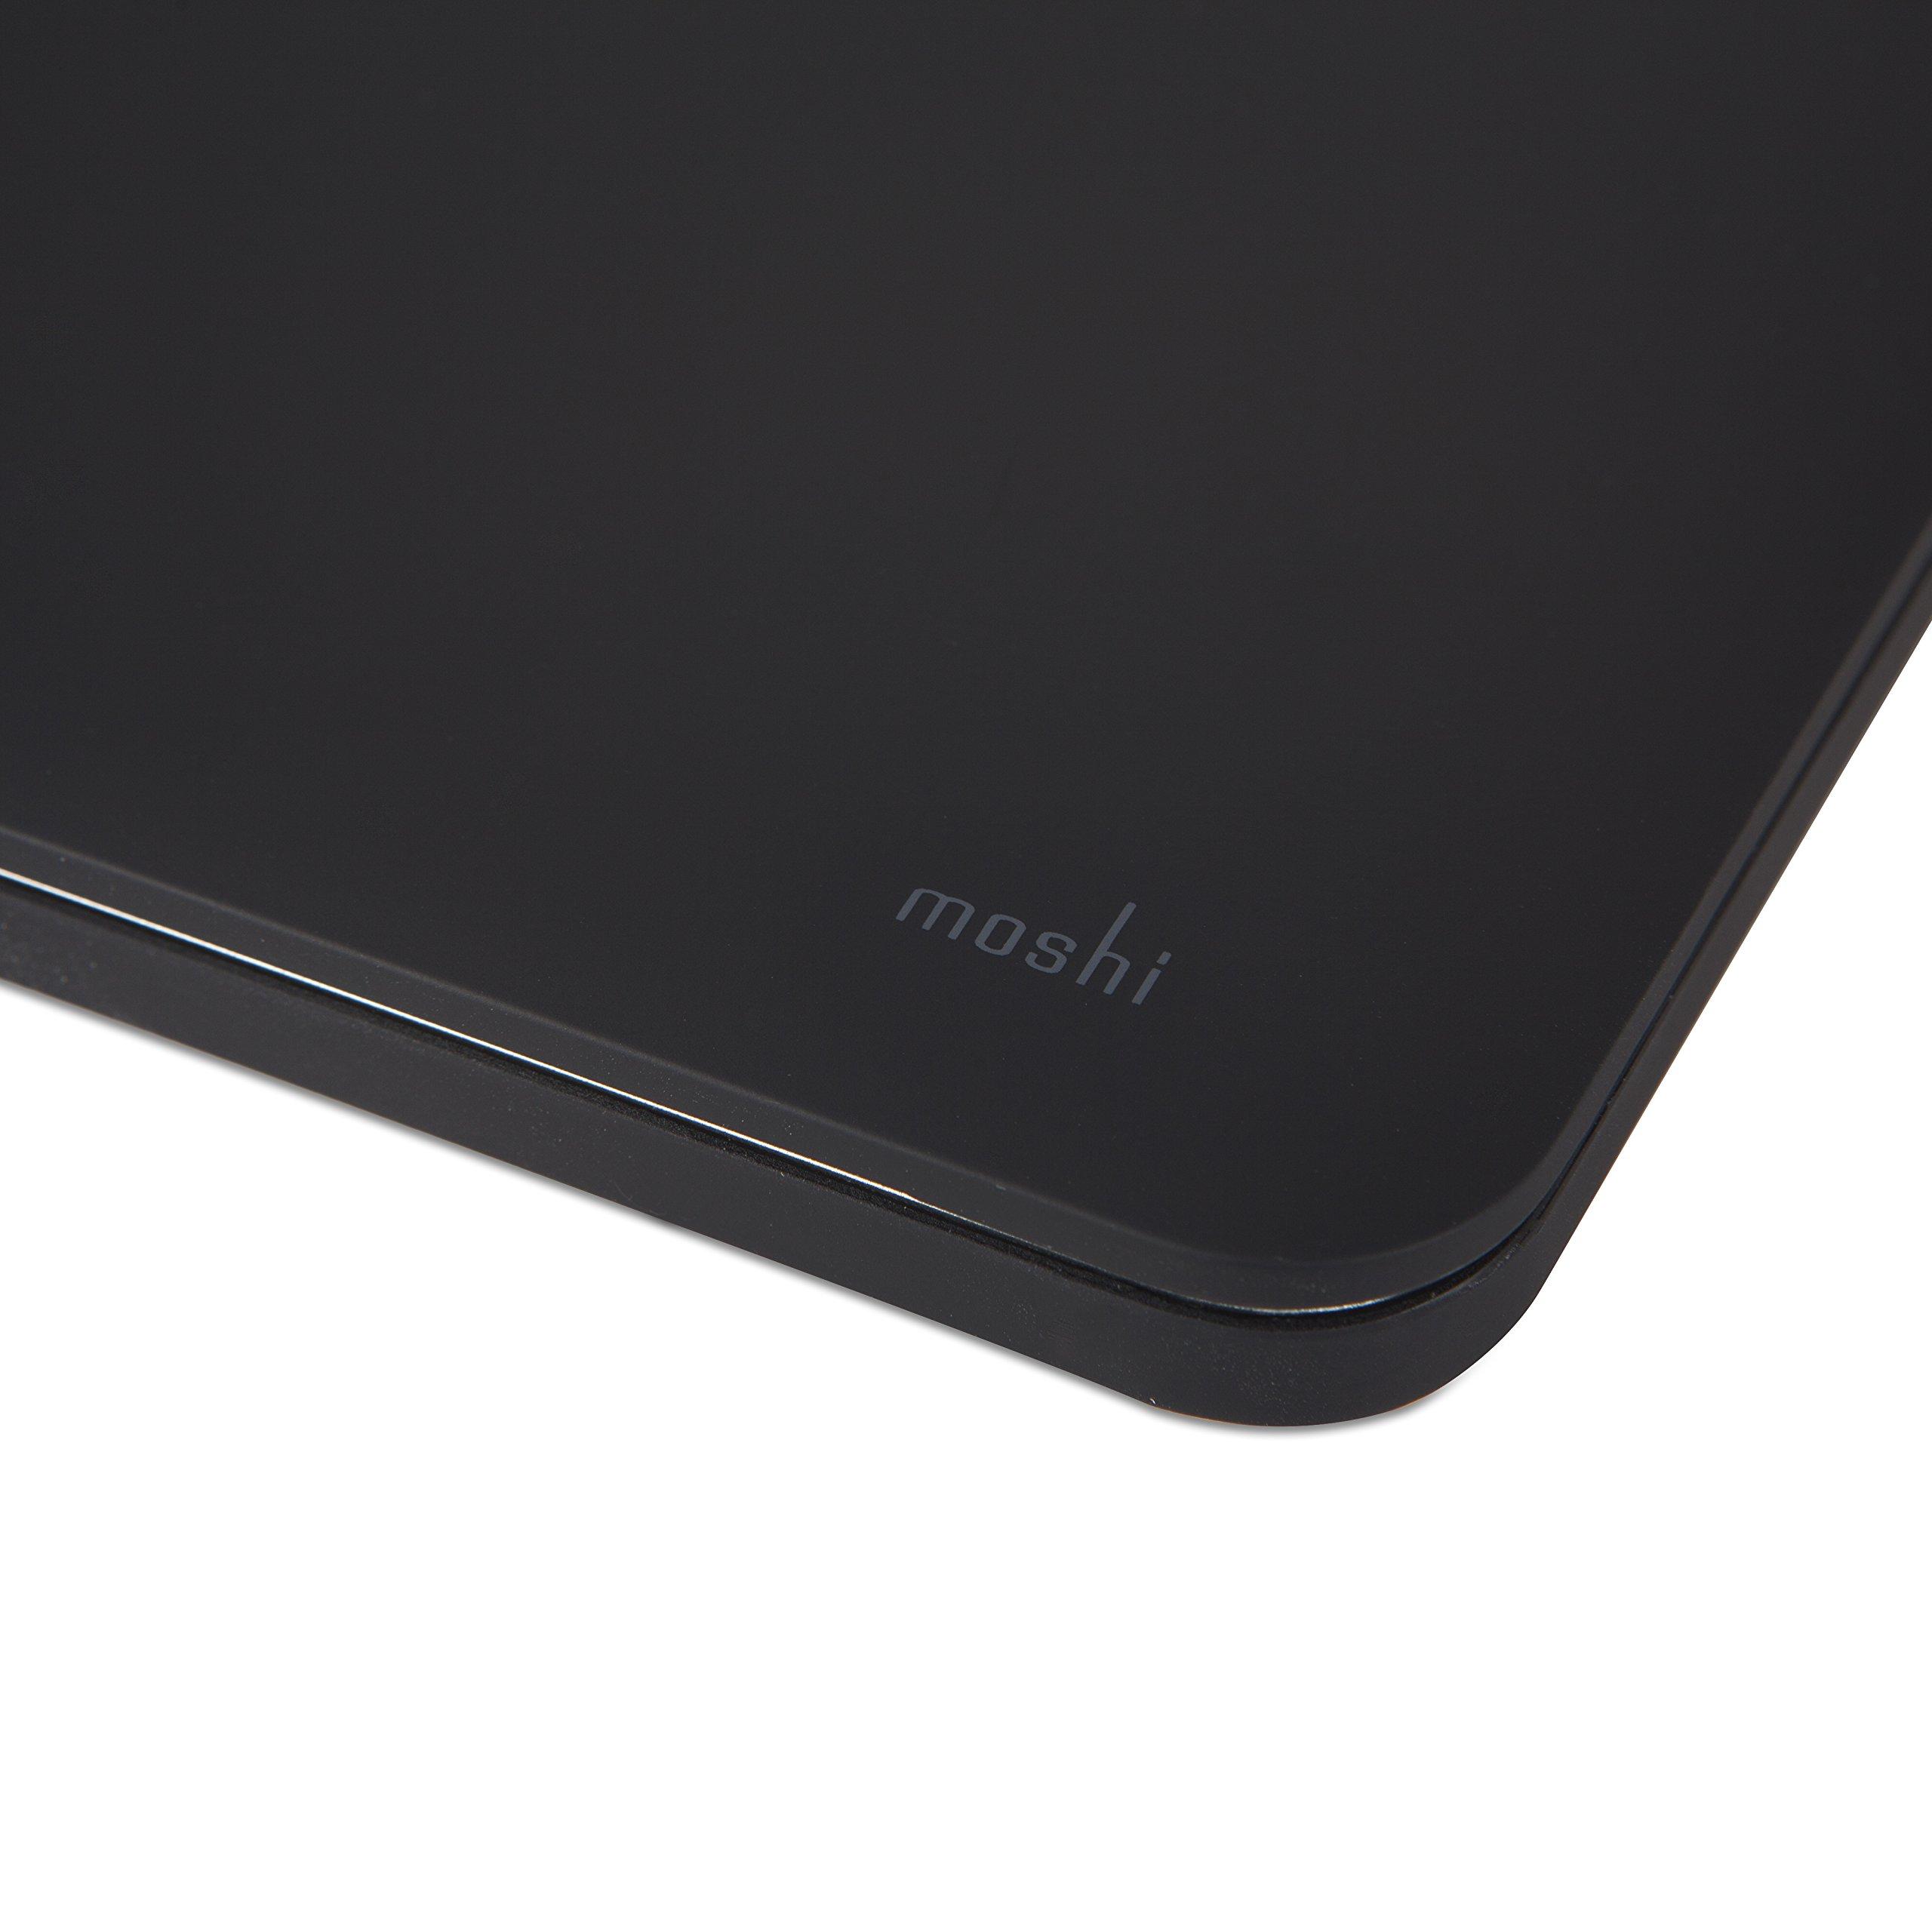 Moshi iGlaze Hard Case for MacBook Pro Retina 13'' (2012-2015) (Graphite Black) by Moshi (Image #5)